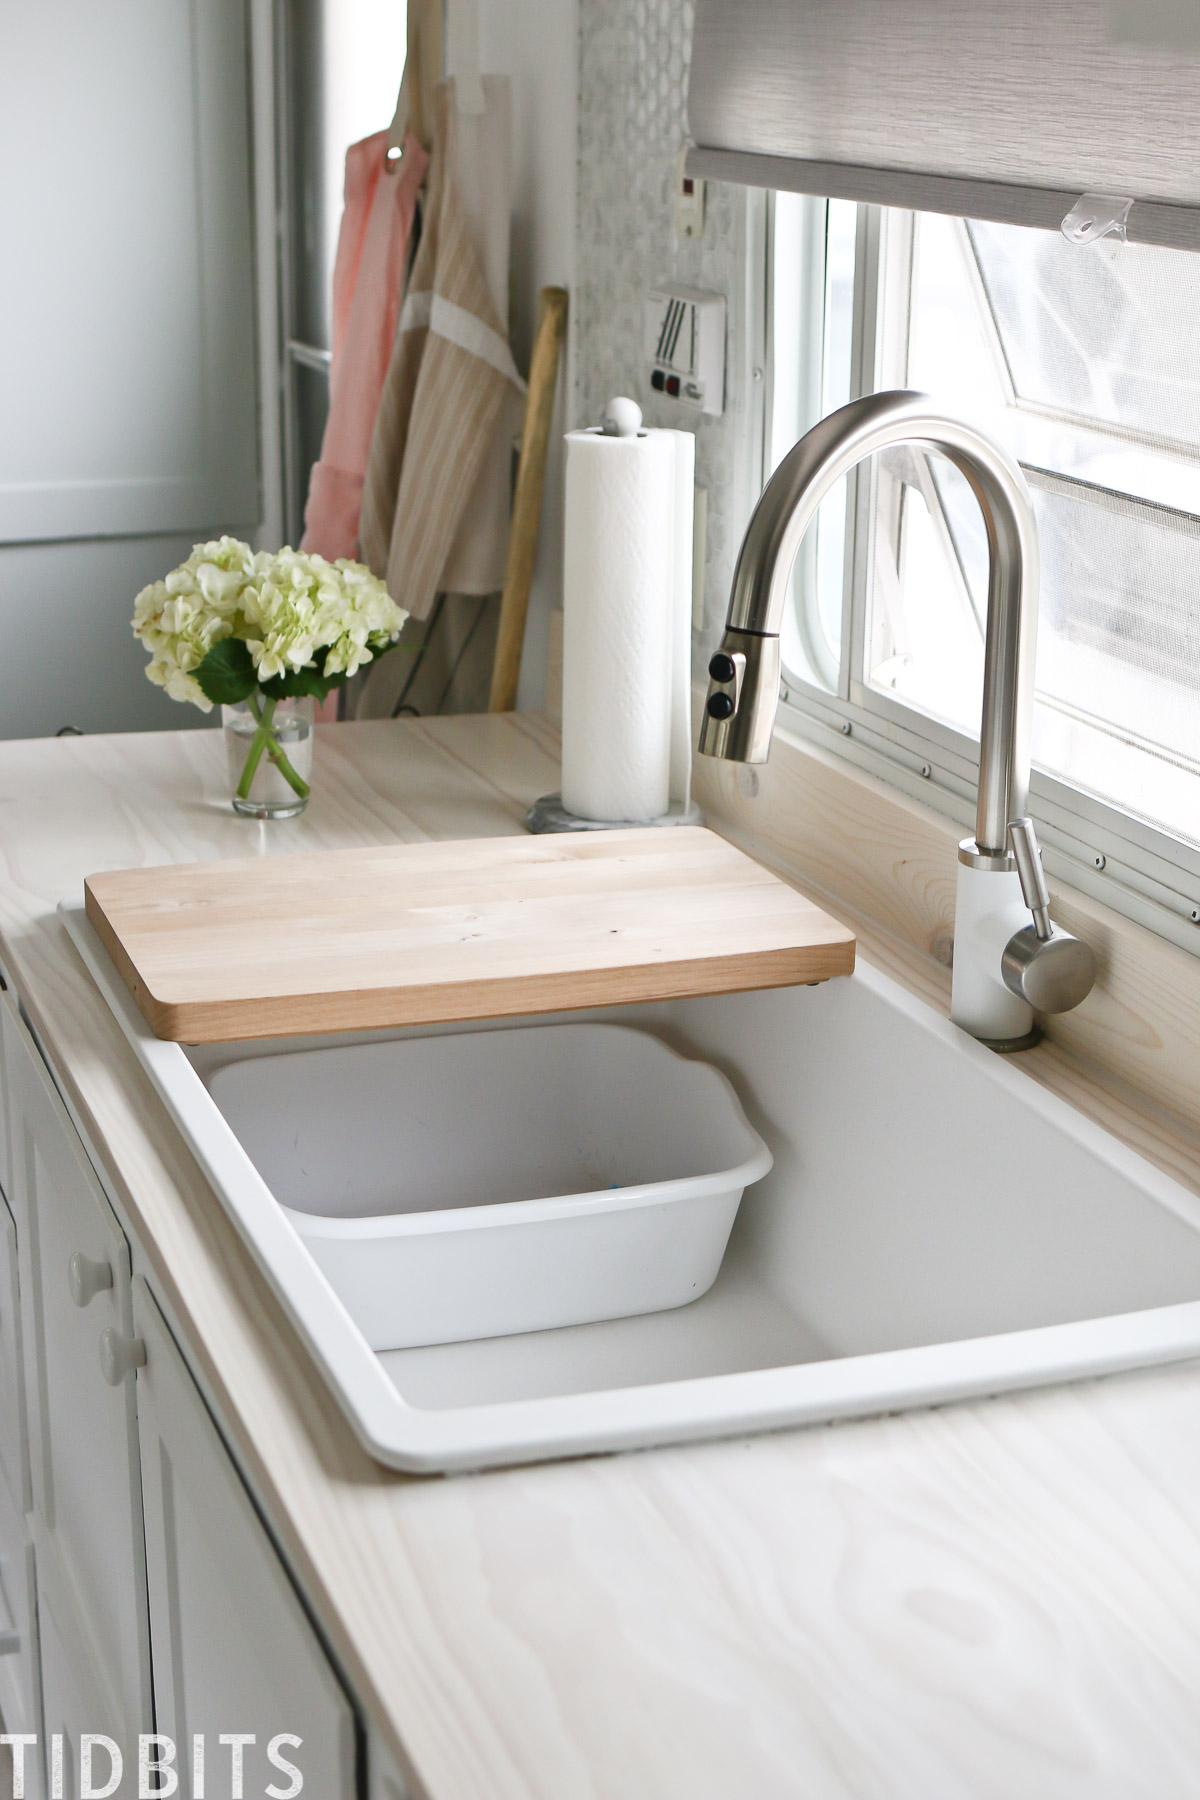 kitchen details in our rv renovation